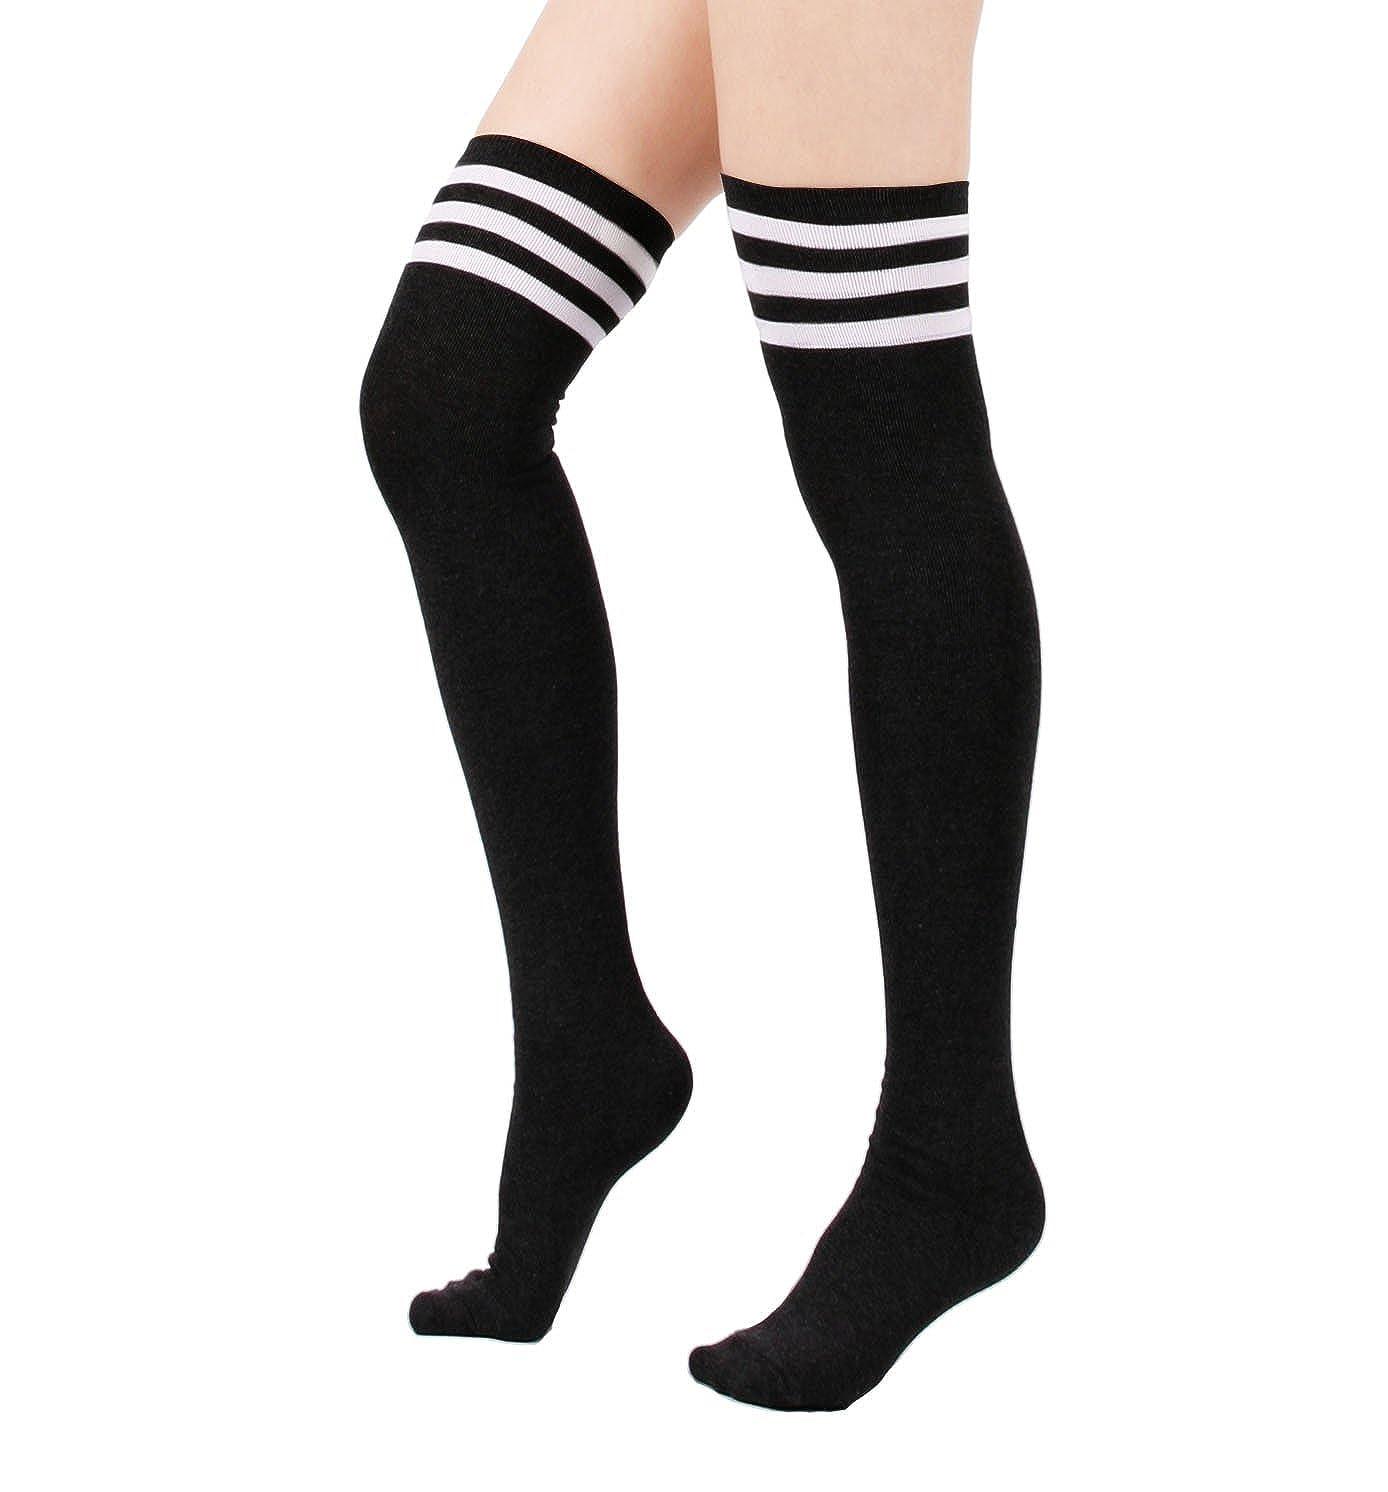 536bb4cb9 Zando Women Triple Stripe Over the Knee High Socks